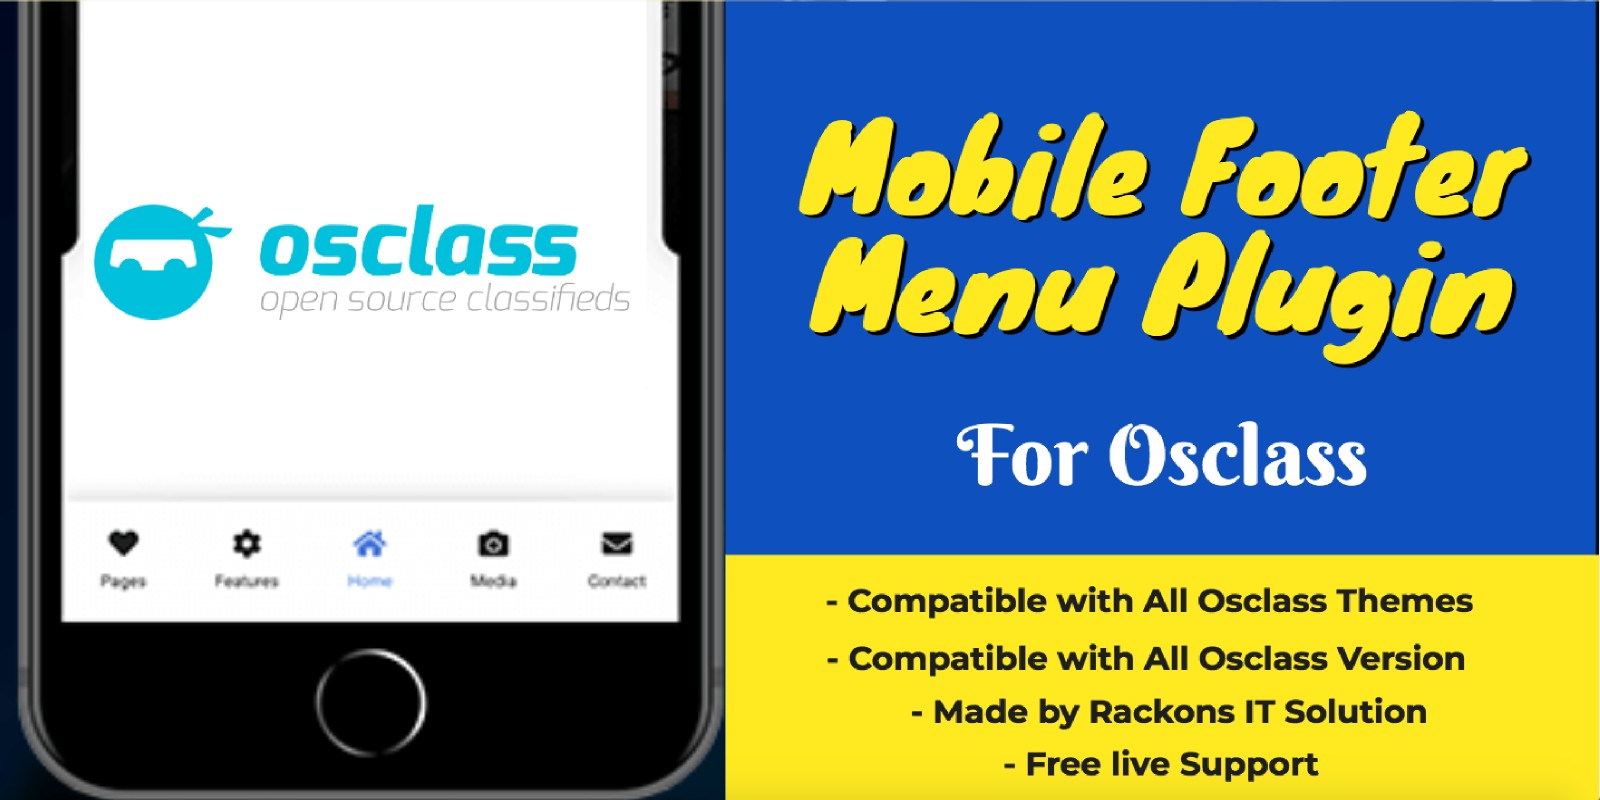 Mobile Footer Menu Plugin For Osclass